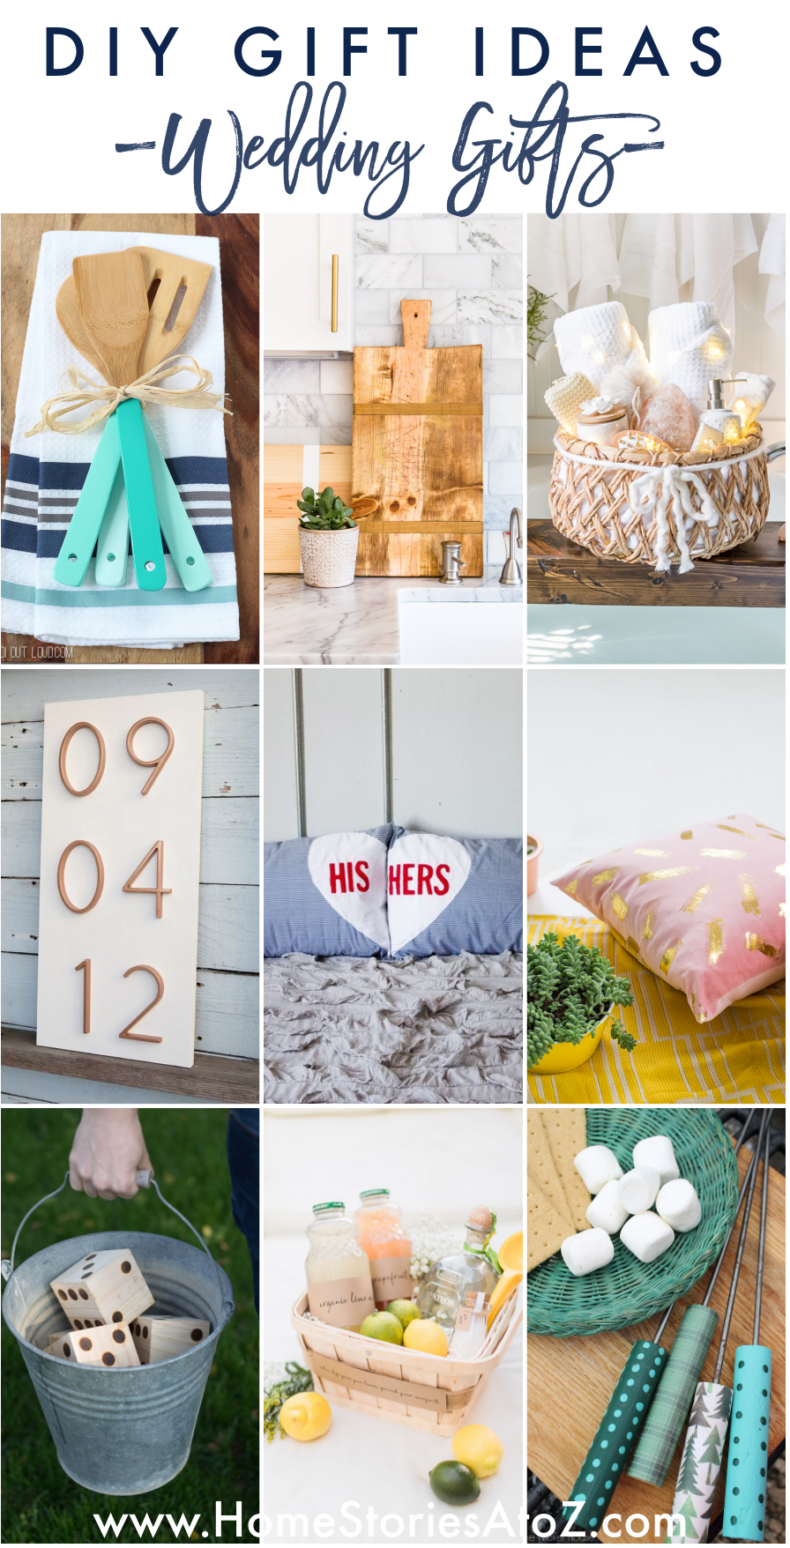 DIY Homemade Wedding Gift Ideas